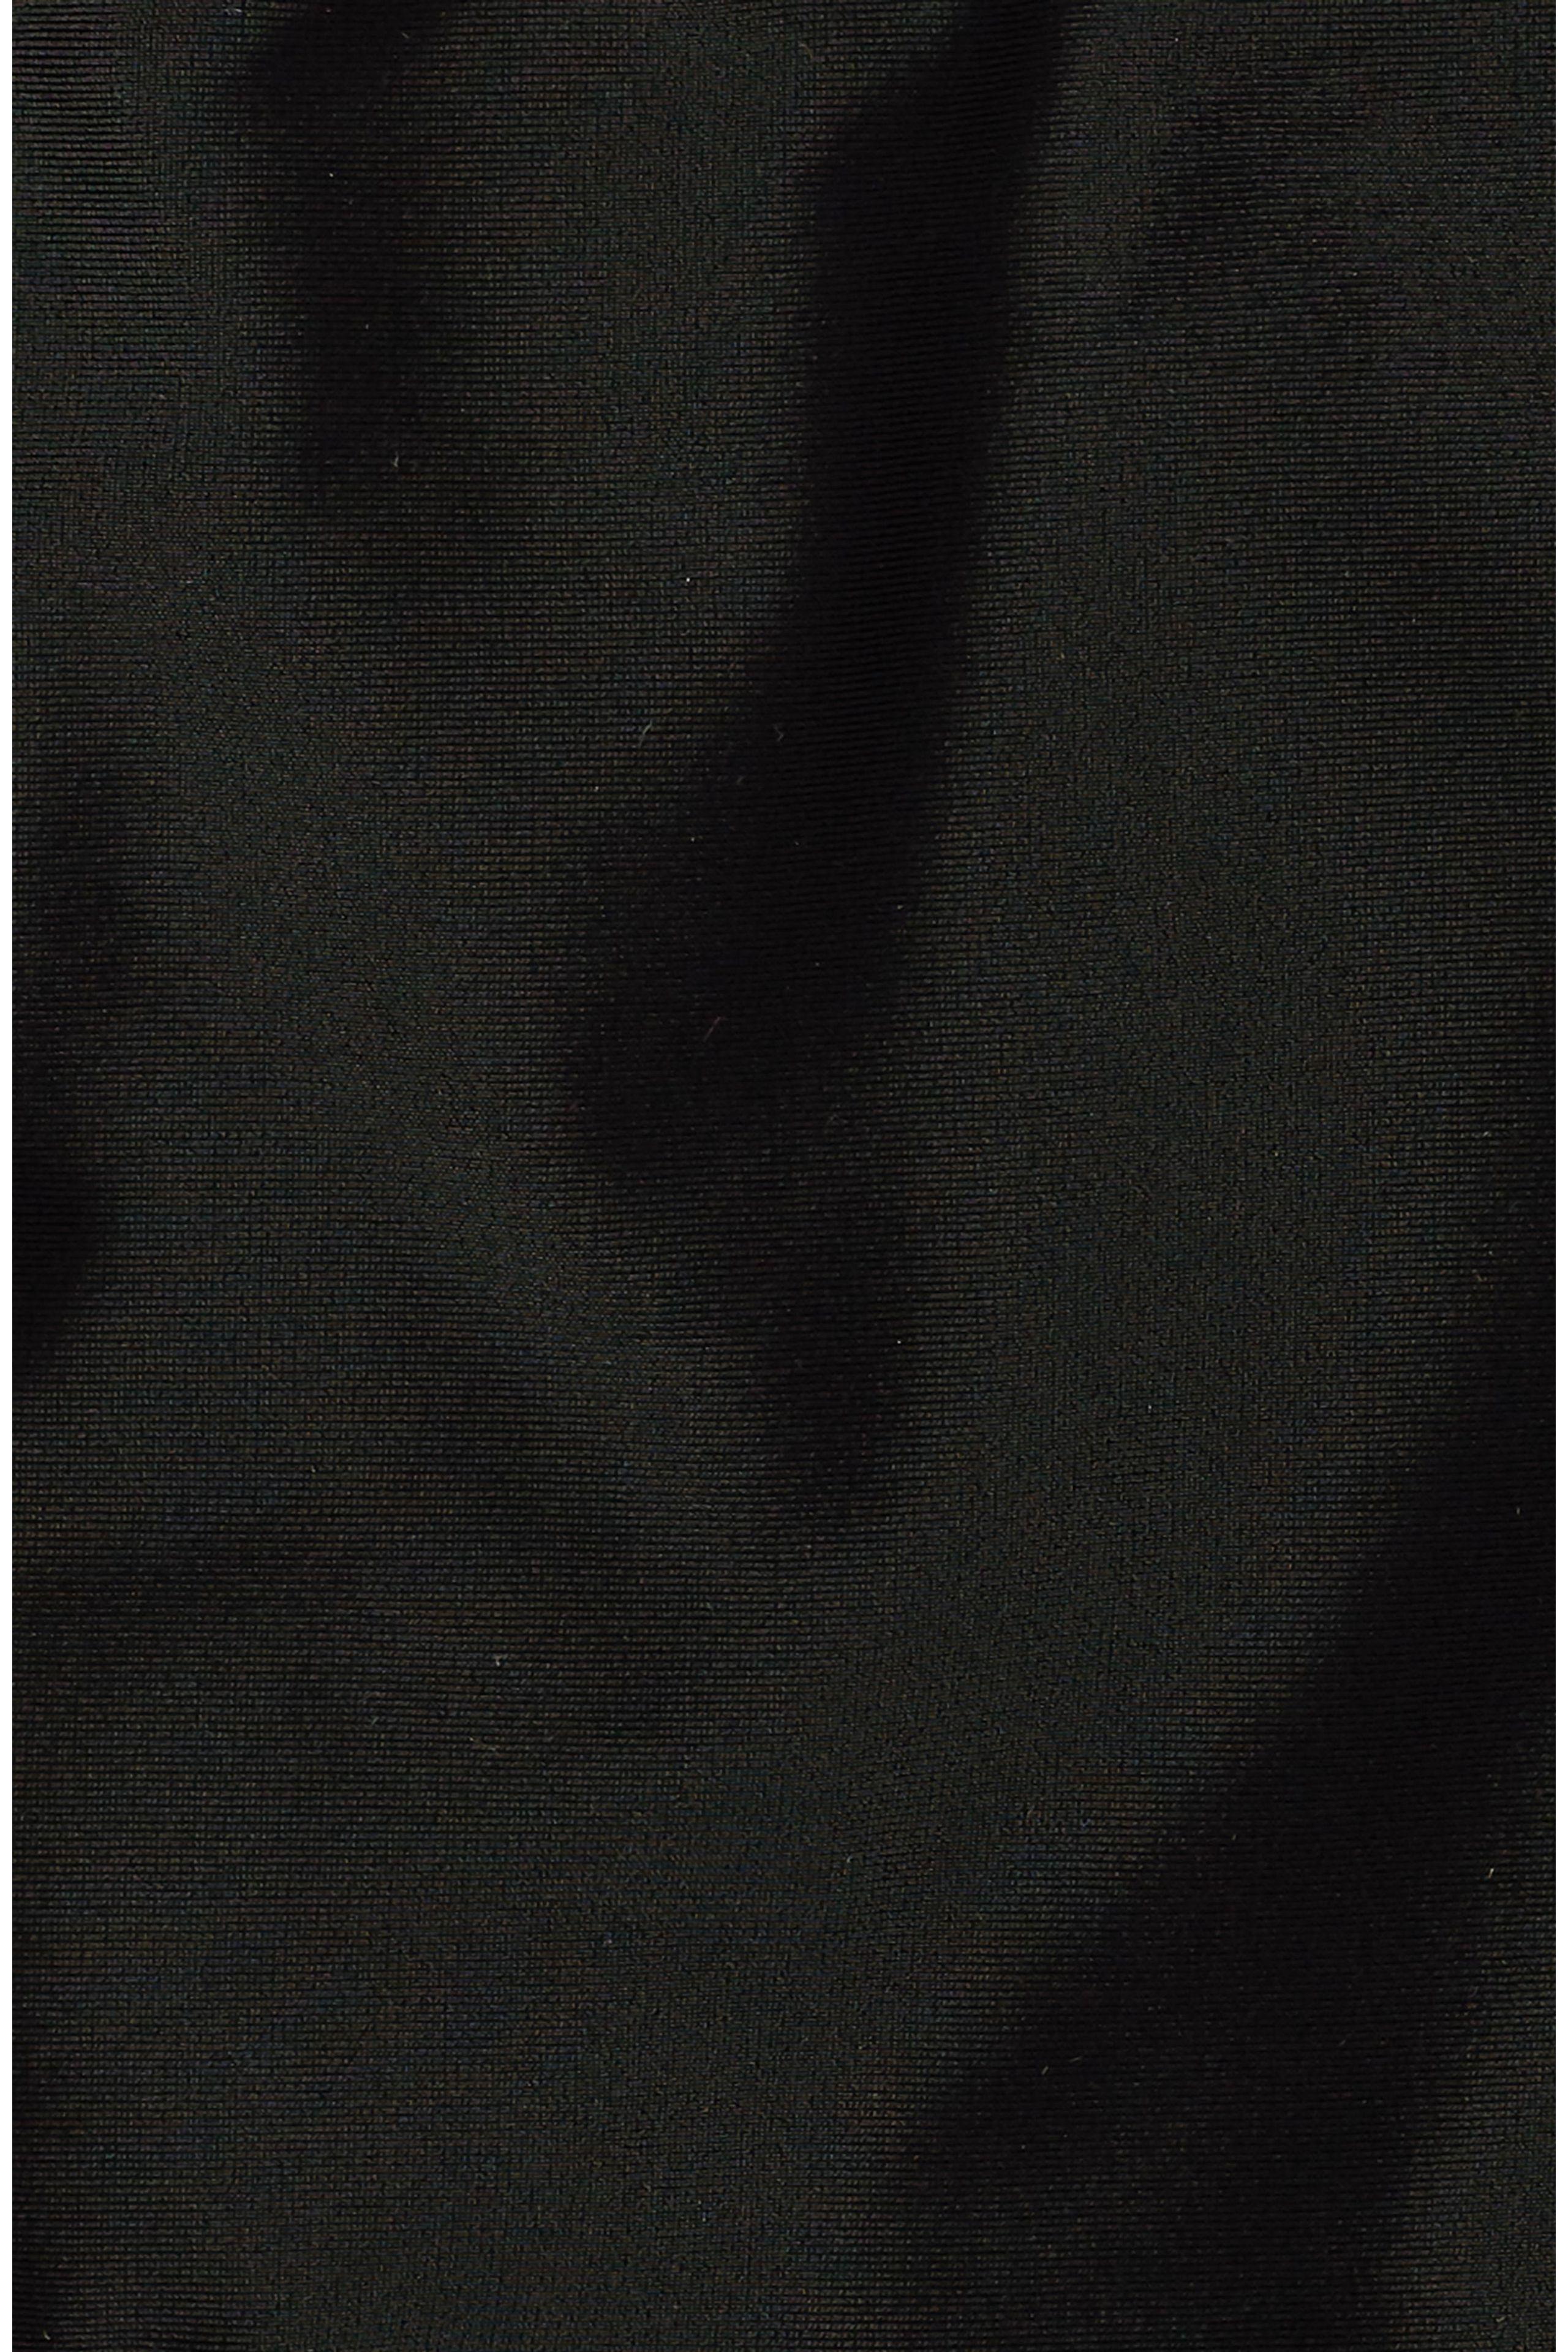 6100AAV00011_987_1-SUNGA-EM-LYCRA-LISA-C--RECORTE-LATERAL